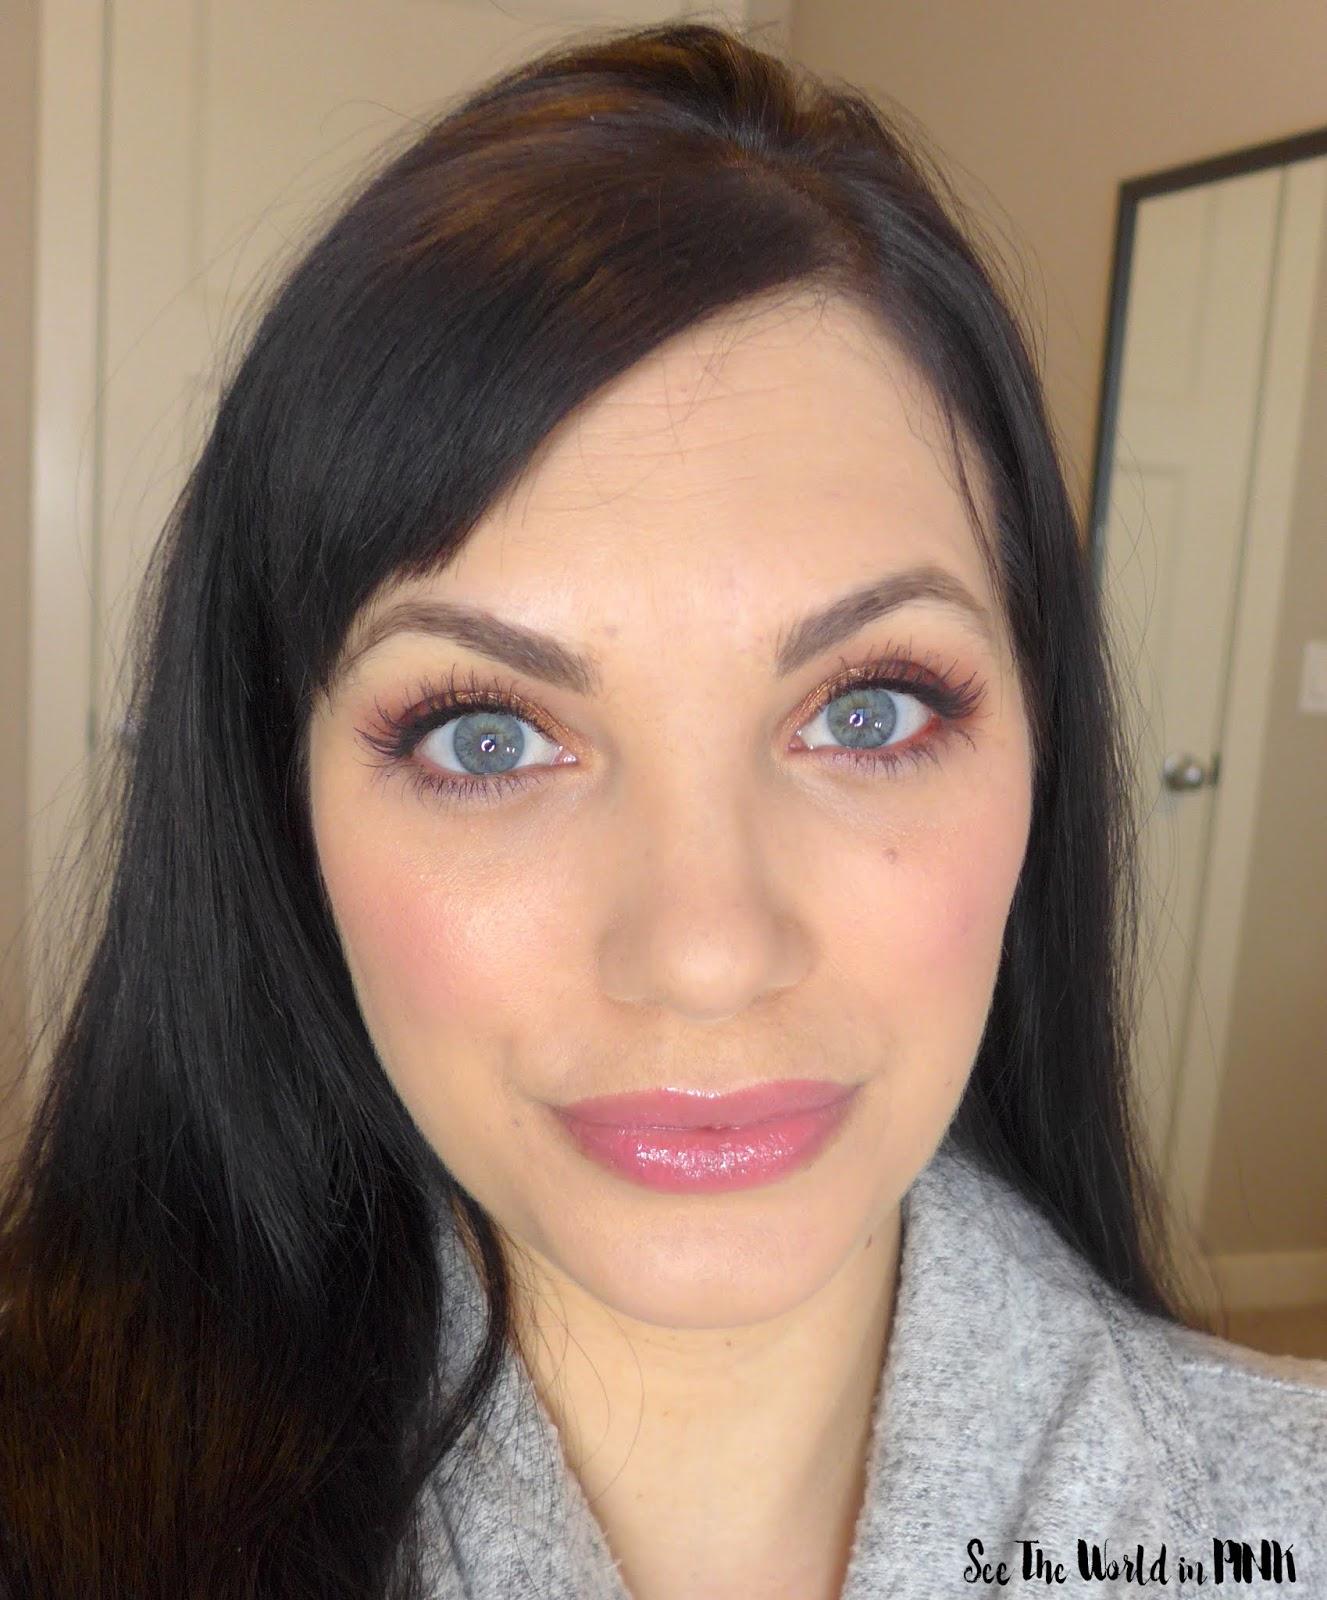 Covergirl Exhibitionist Mascara